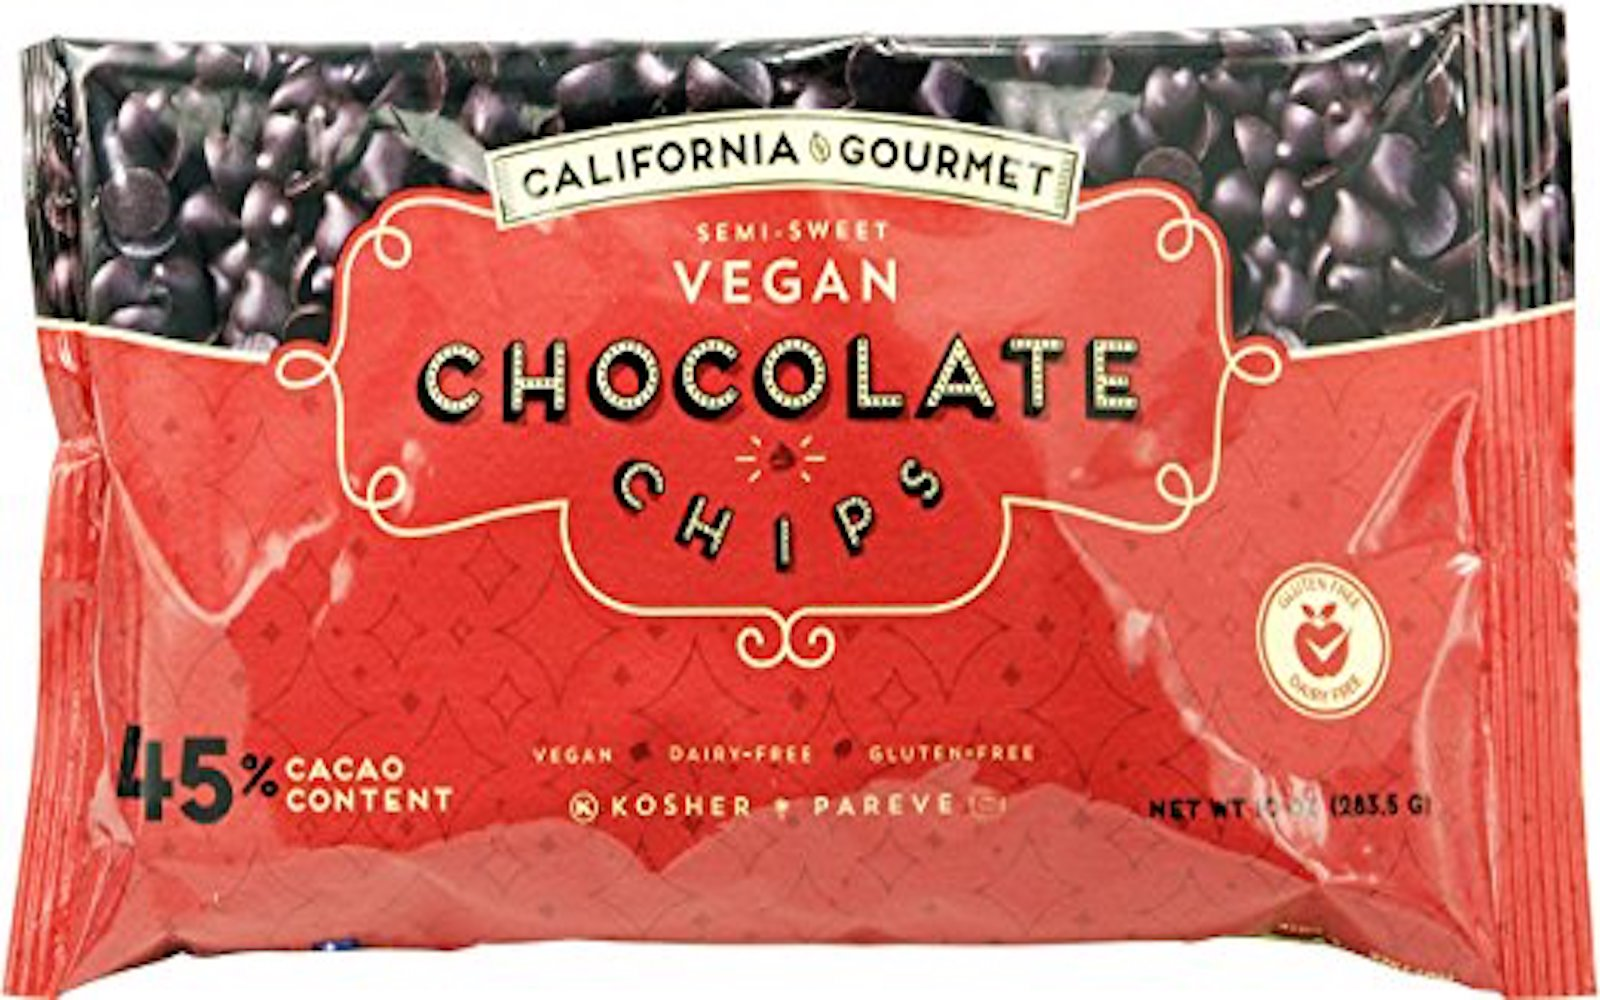 california gourmet chocolate vegan chips